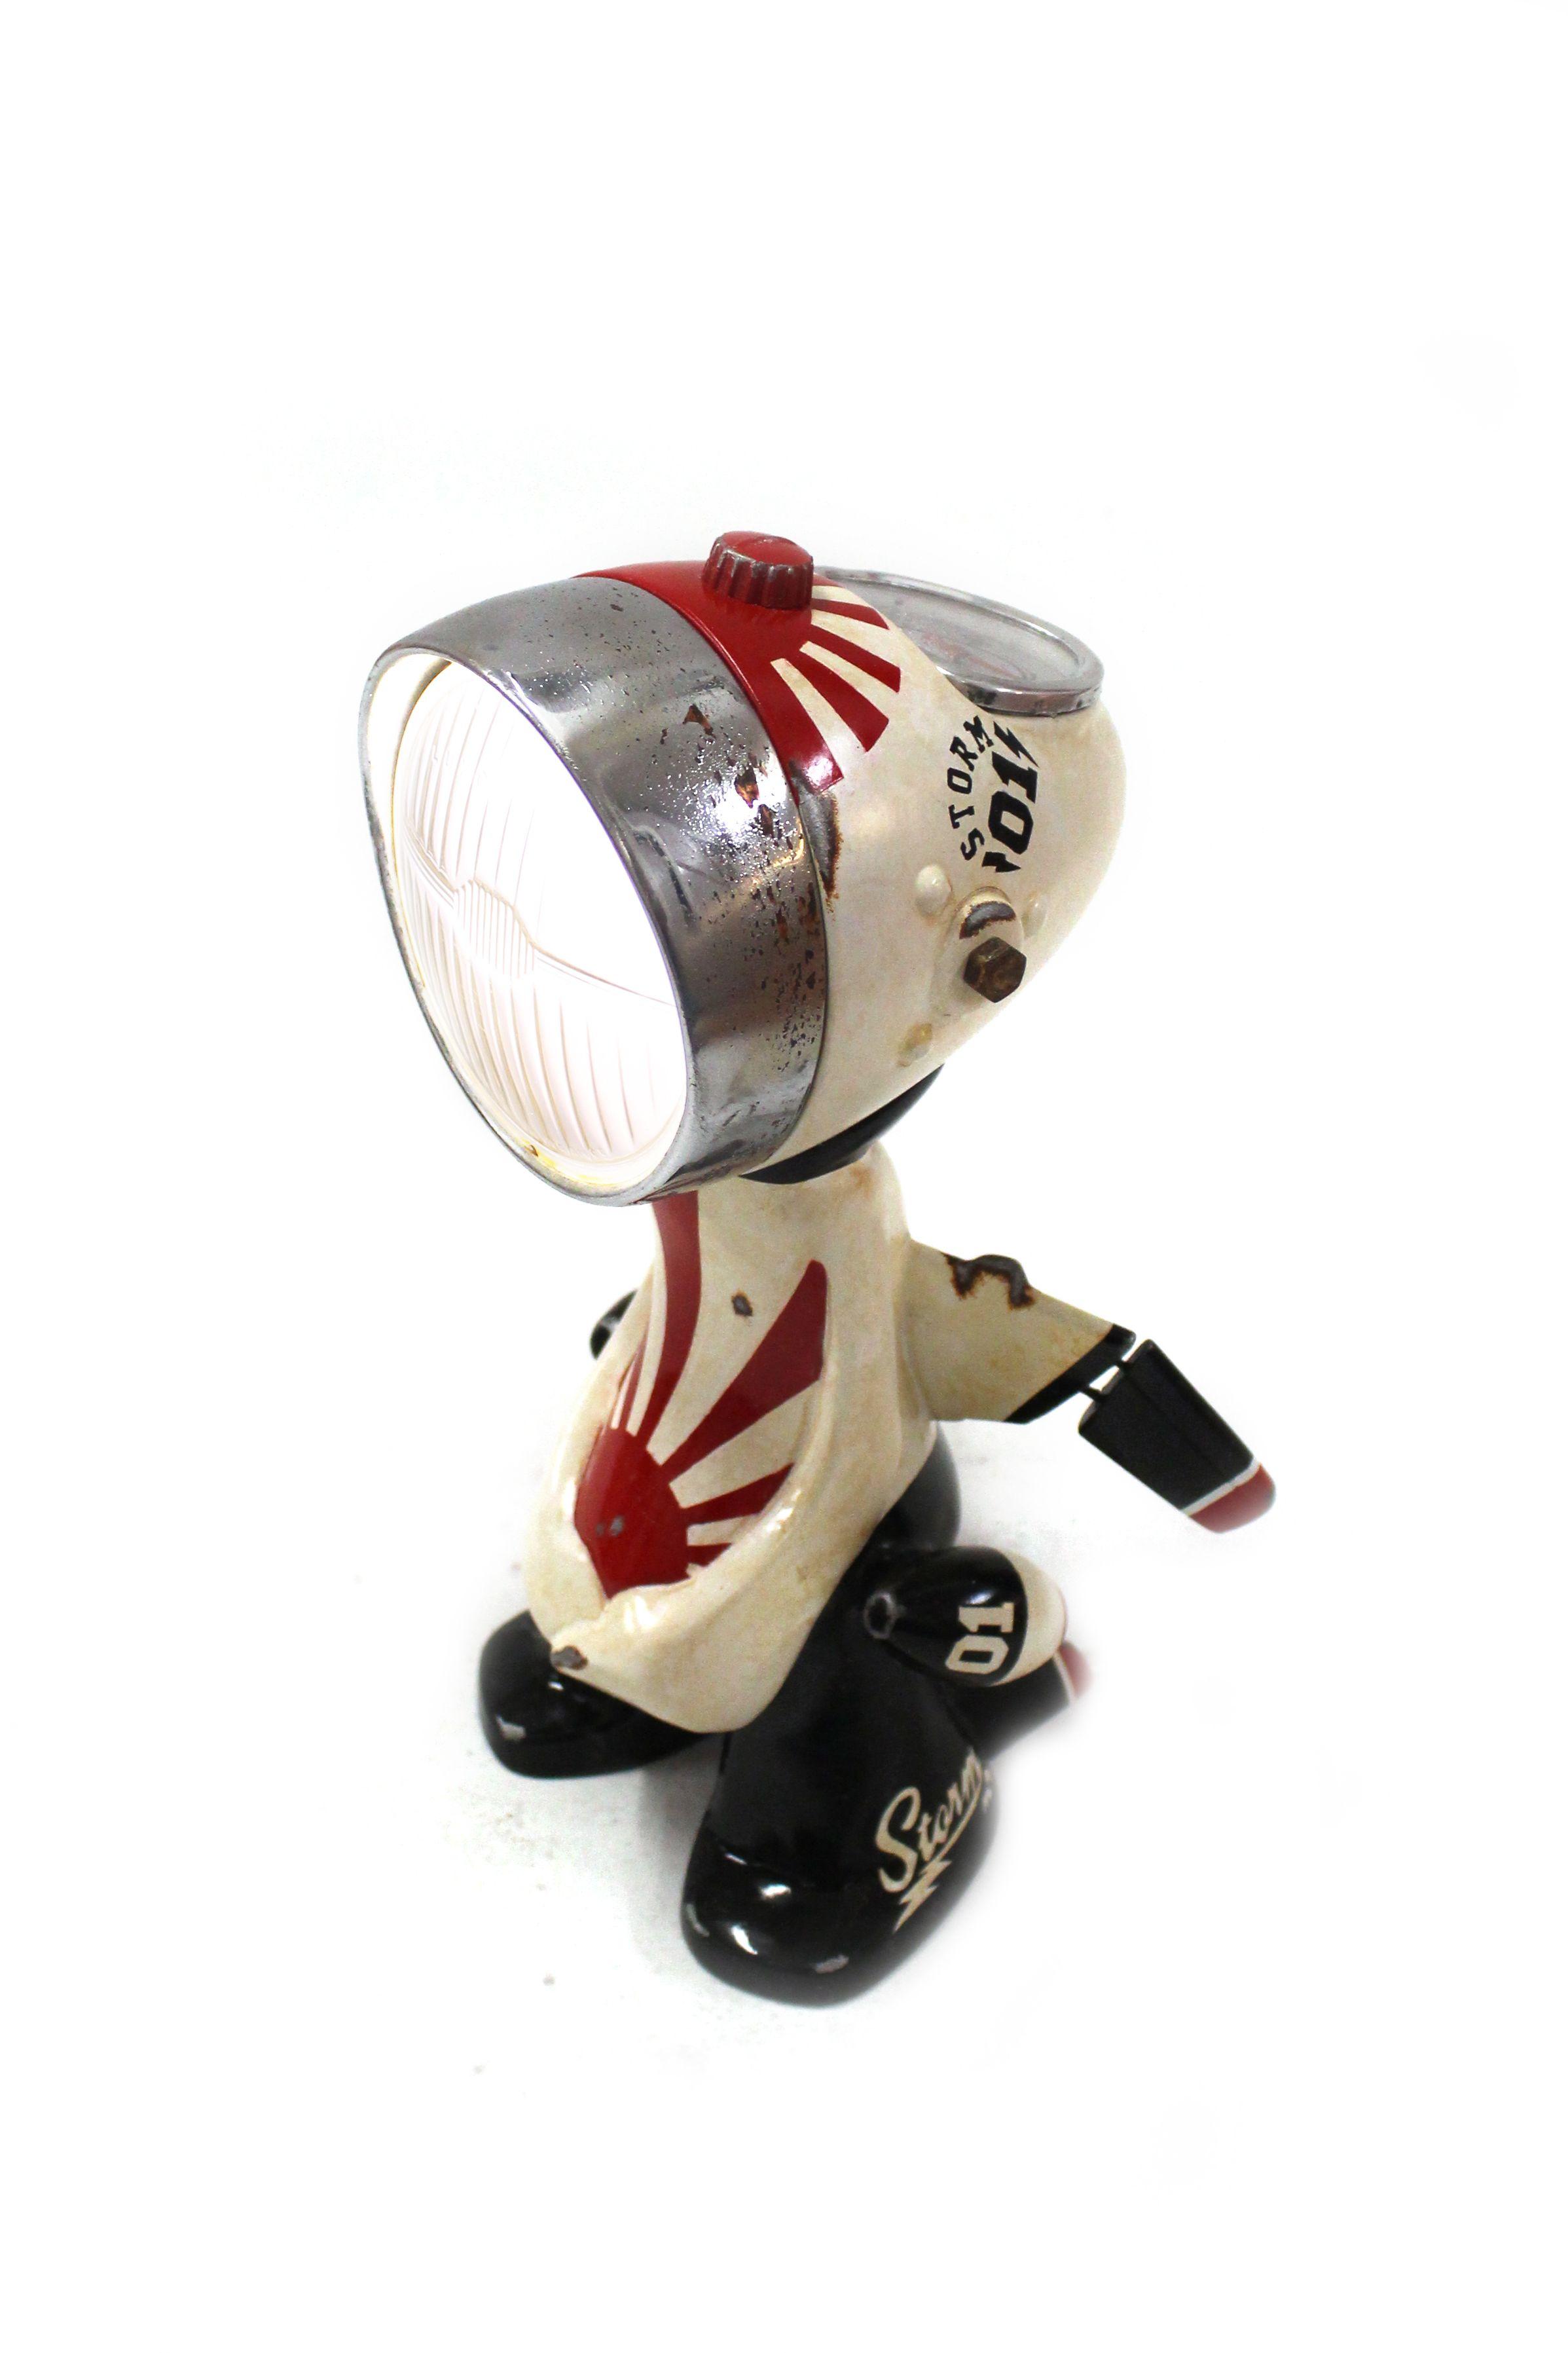 Range of Arts - Sculpture Lampe Robot - Nanan Hiro